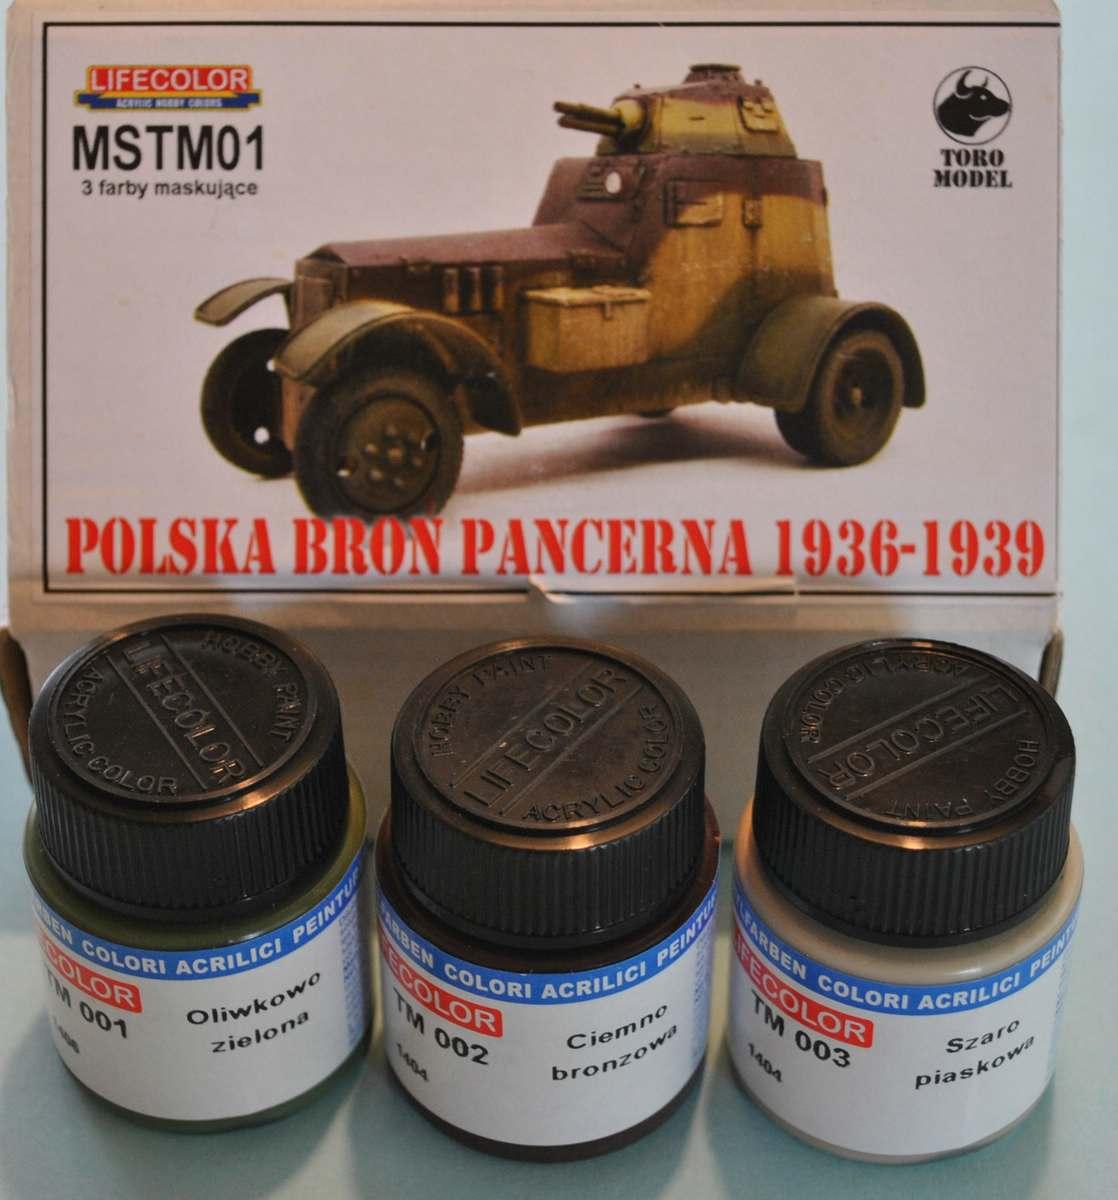 Life-Color-Farben-polnische-Armee-1939-1 Farben polnische Armee 1939 von Life Color